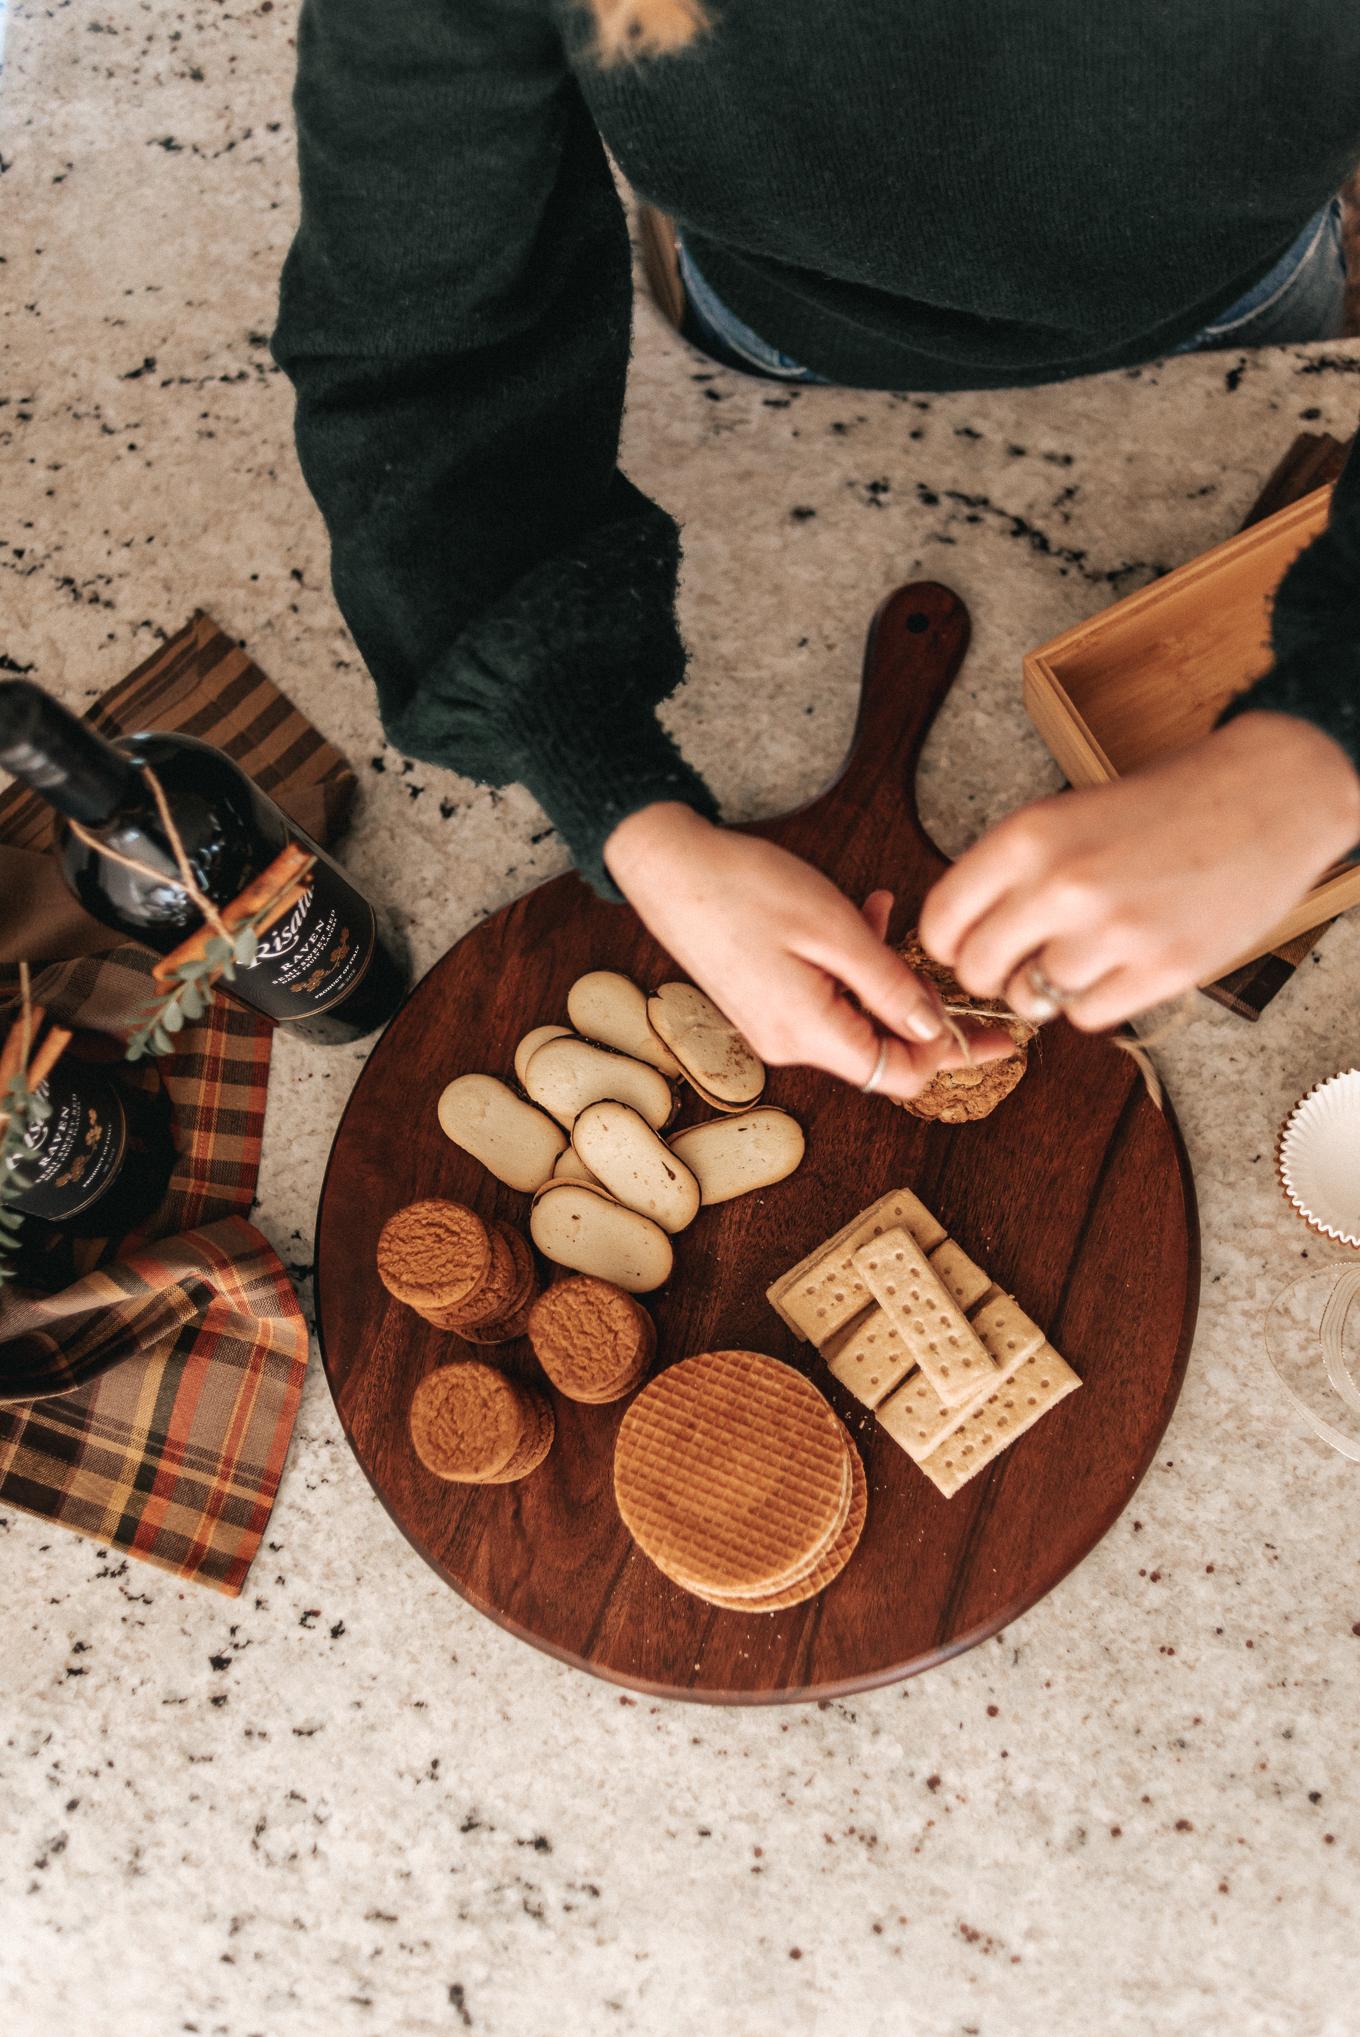 How to make a Christmas Cookie Bento Box   Homemade Christmas Gift Idea   Louella Reese